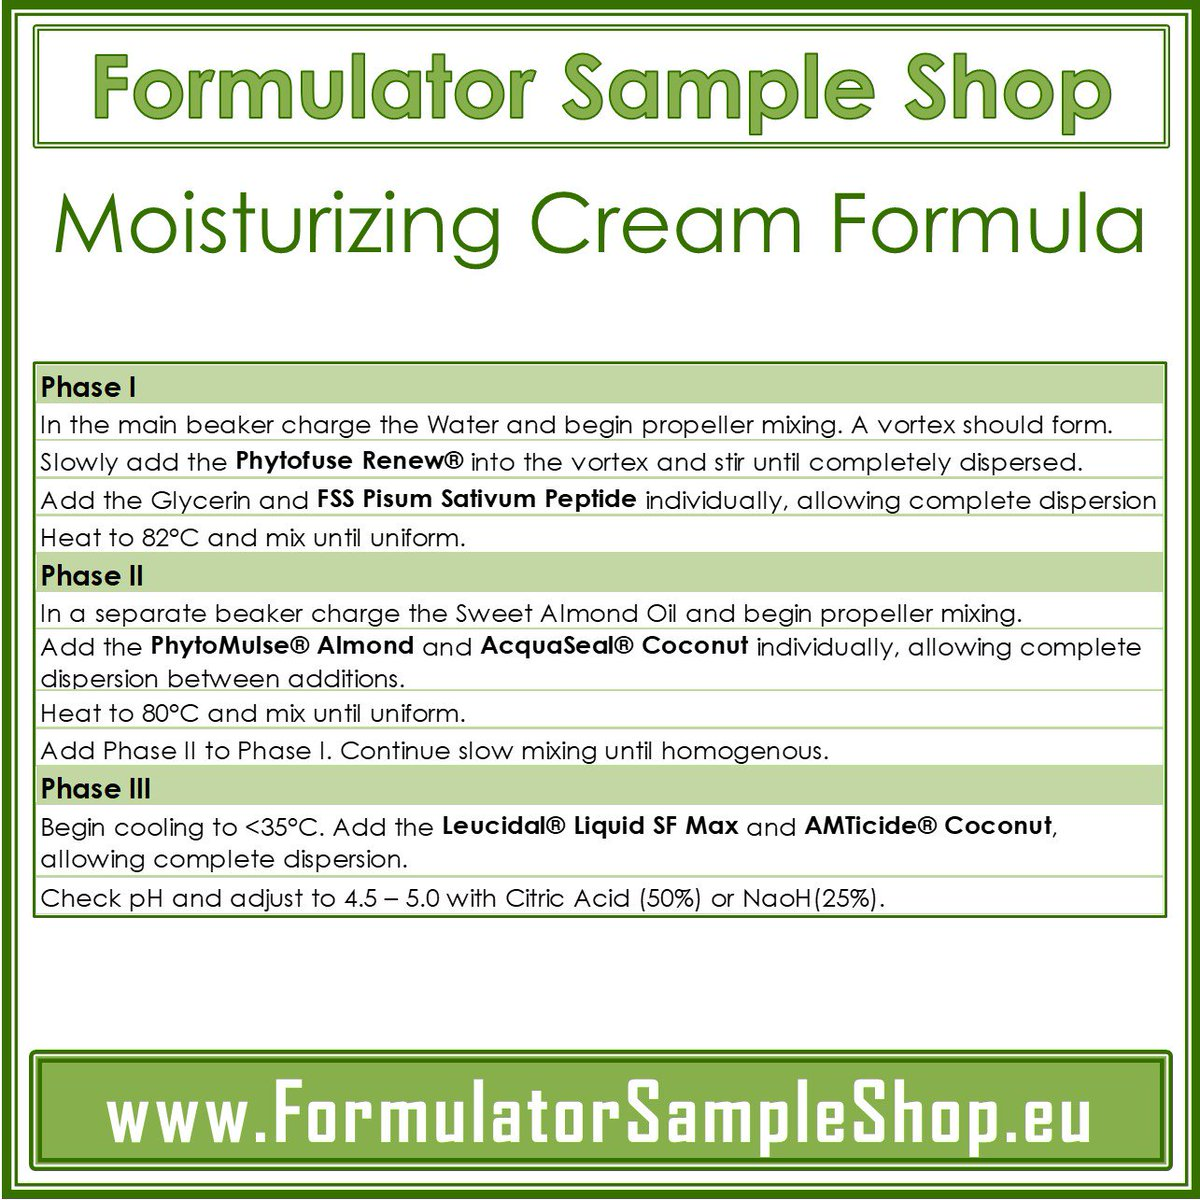 Formulator Sample Shop Europe on Twitter: